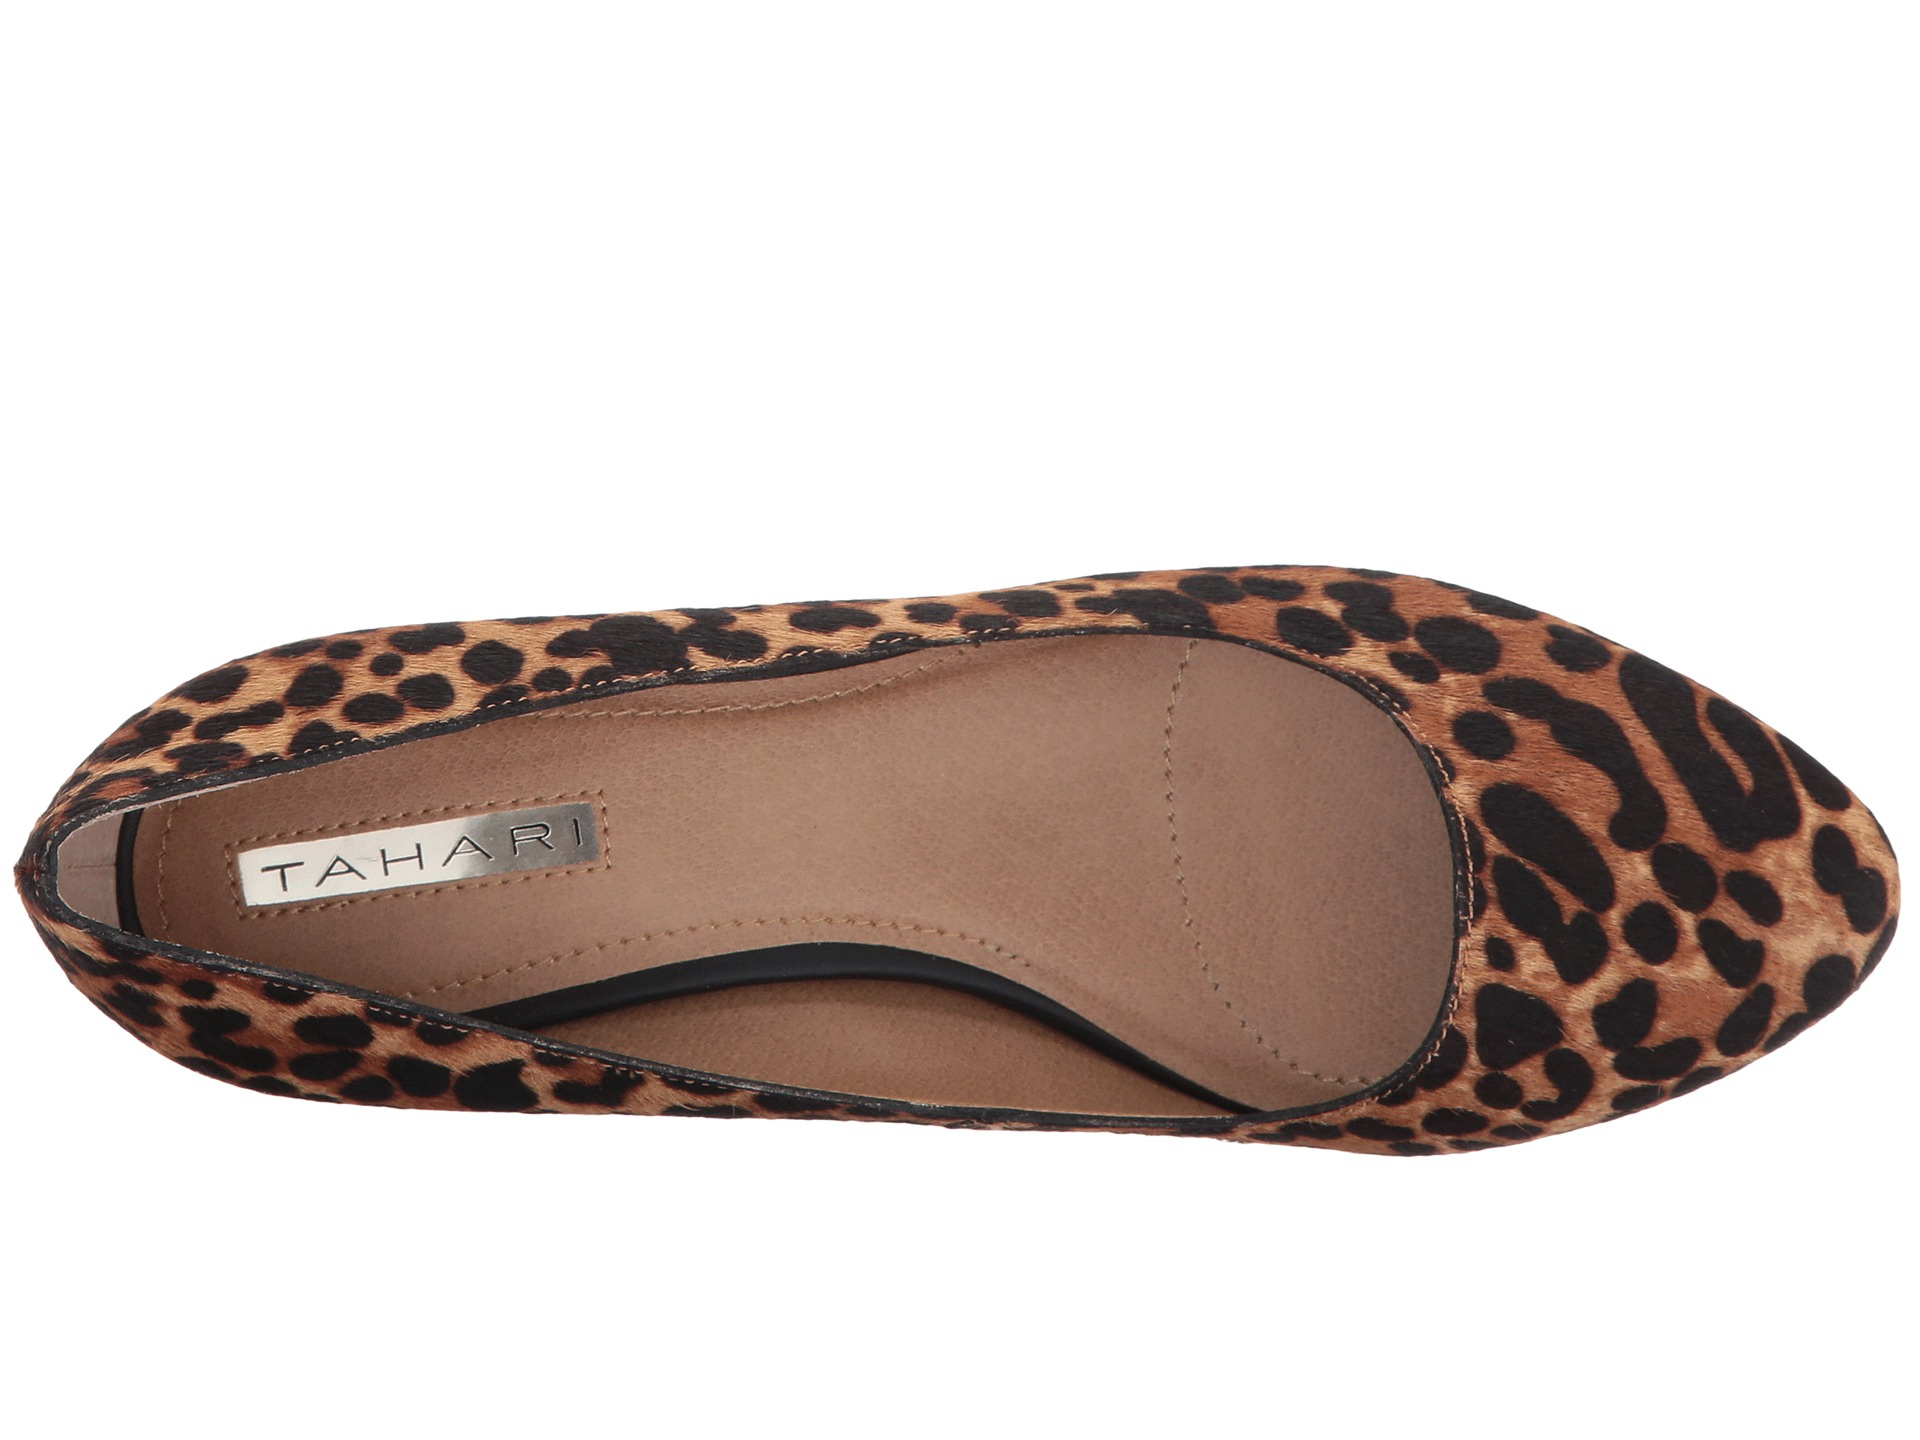 Tahari Amanda Shoes Size